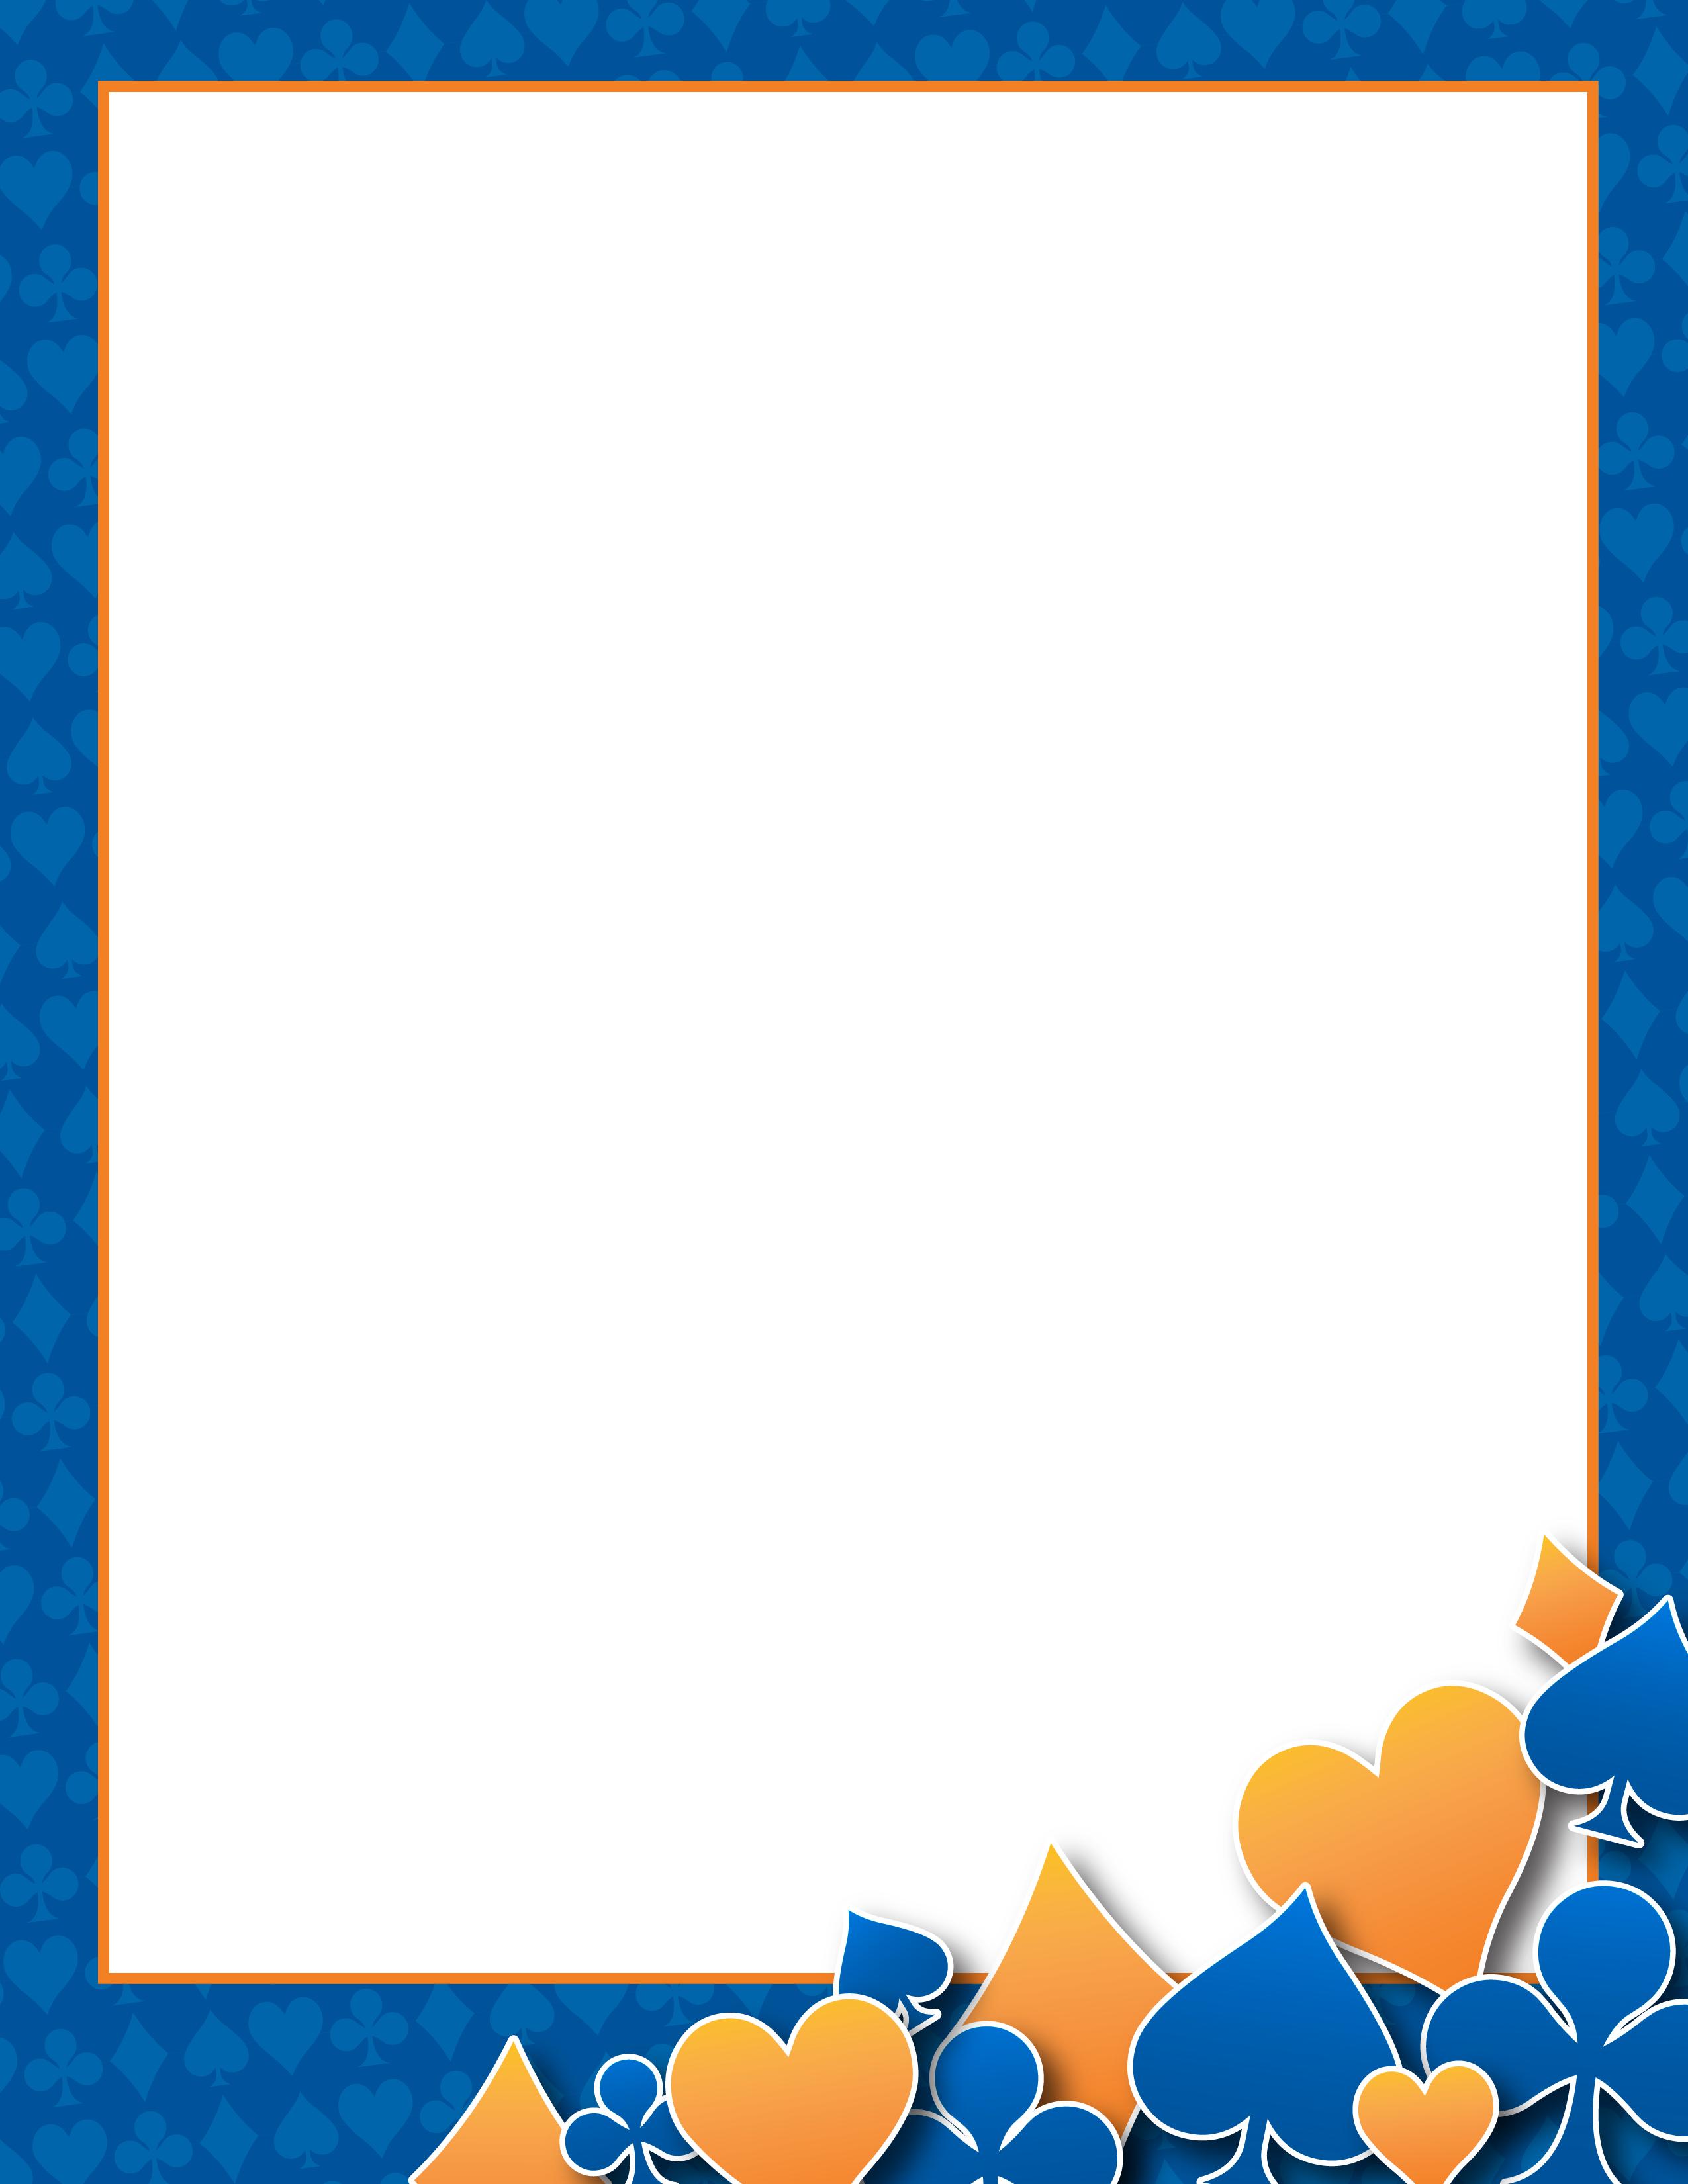 download overlaid blue orange theme below